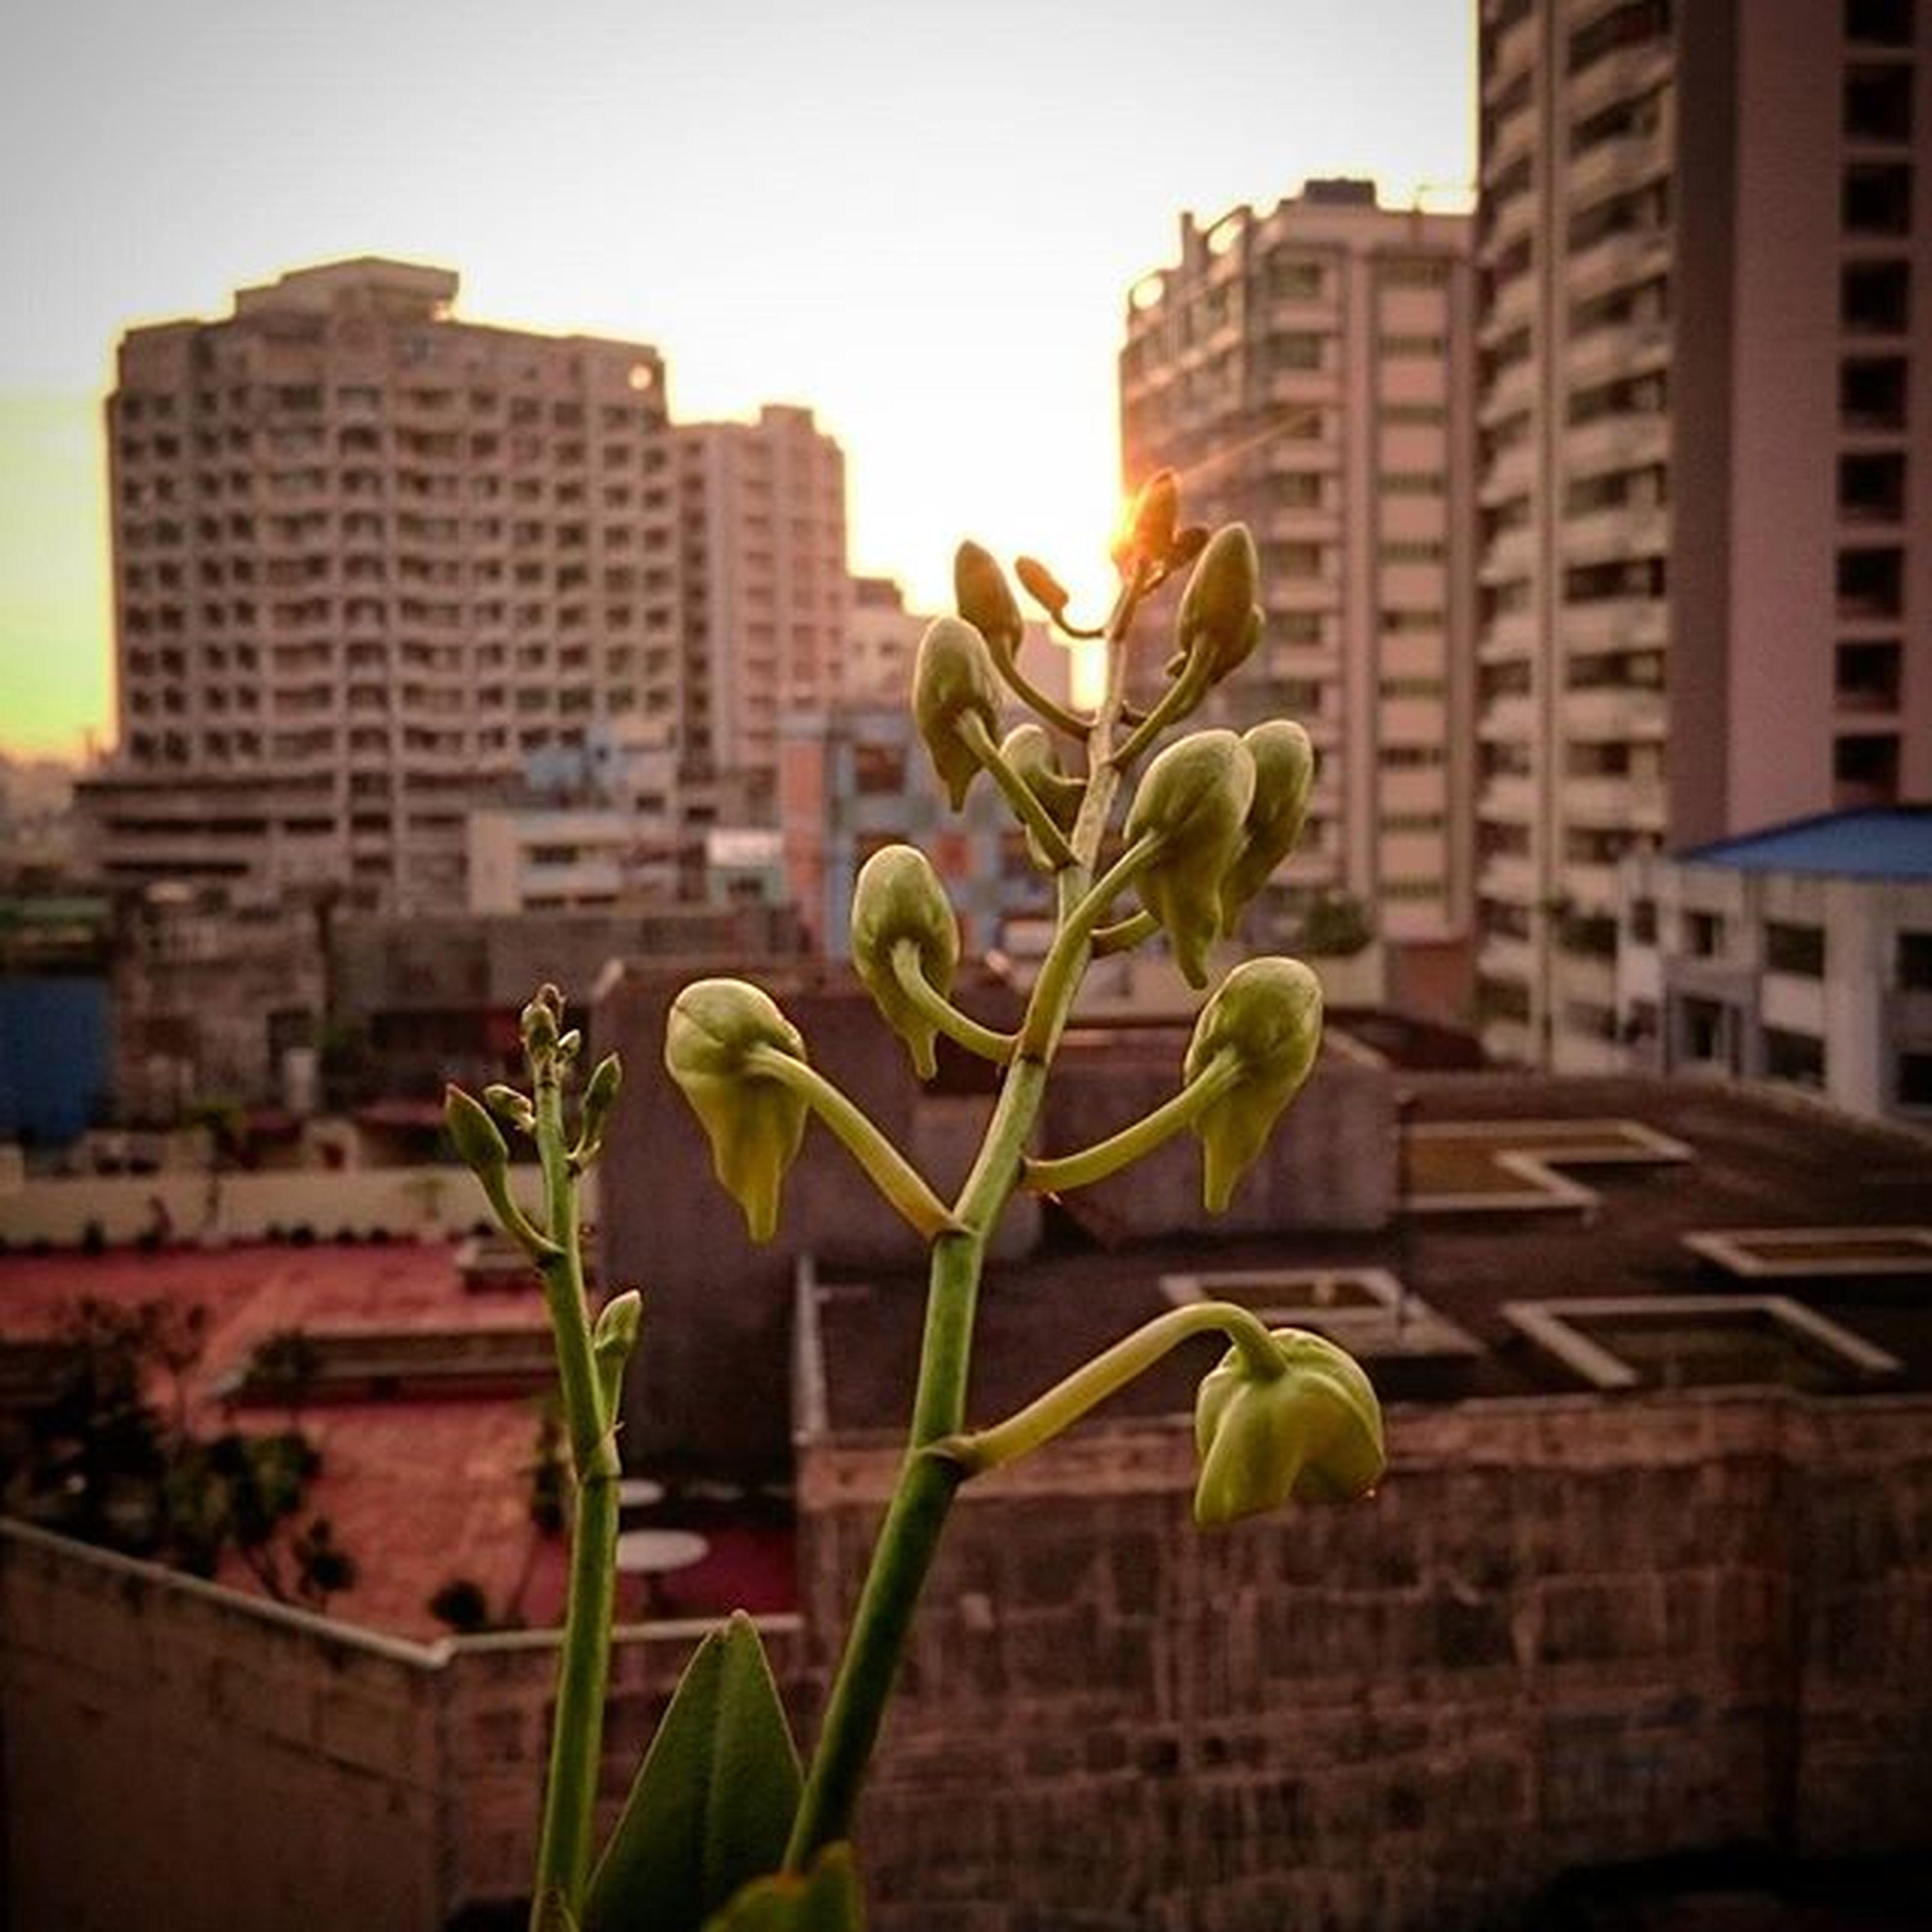 01/09/2016 Sunrise 3 SunIsUp Orchid Orchids Flowerbuds Flower Myflower MyFlowers Soontoopen Soontoooenflowers